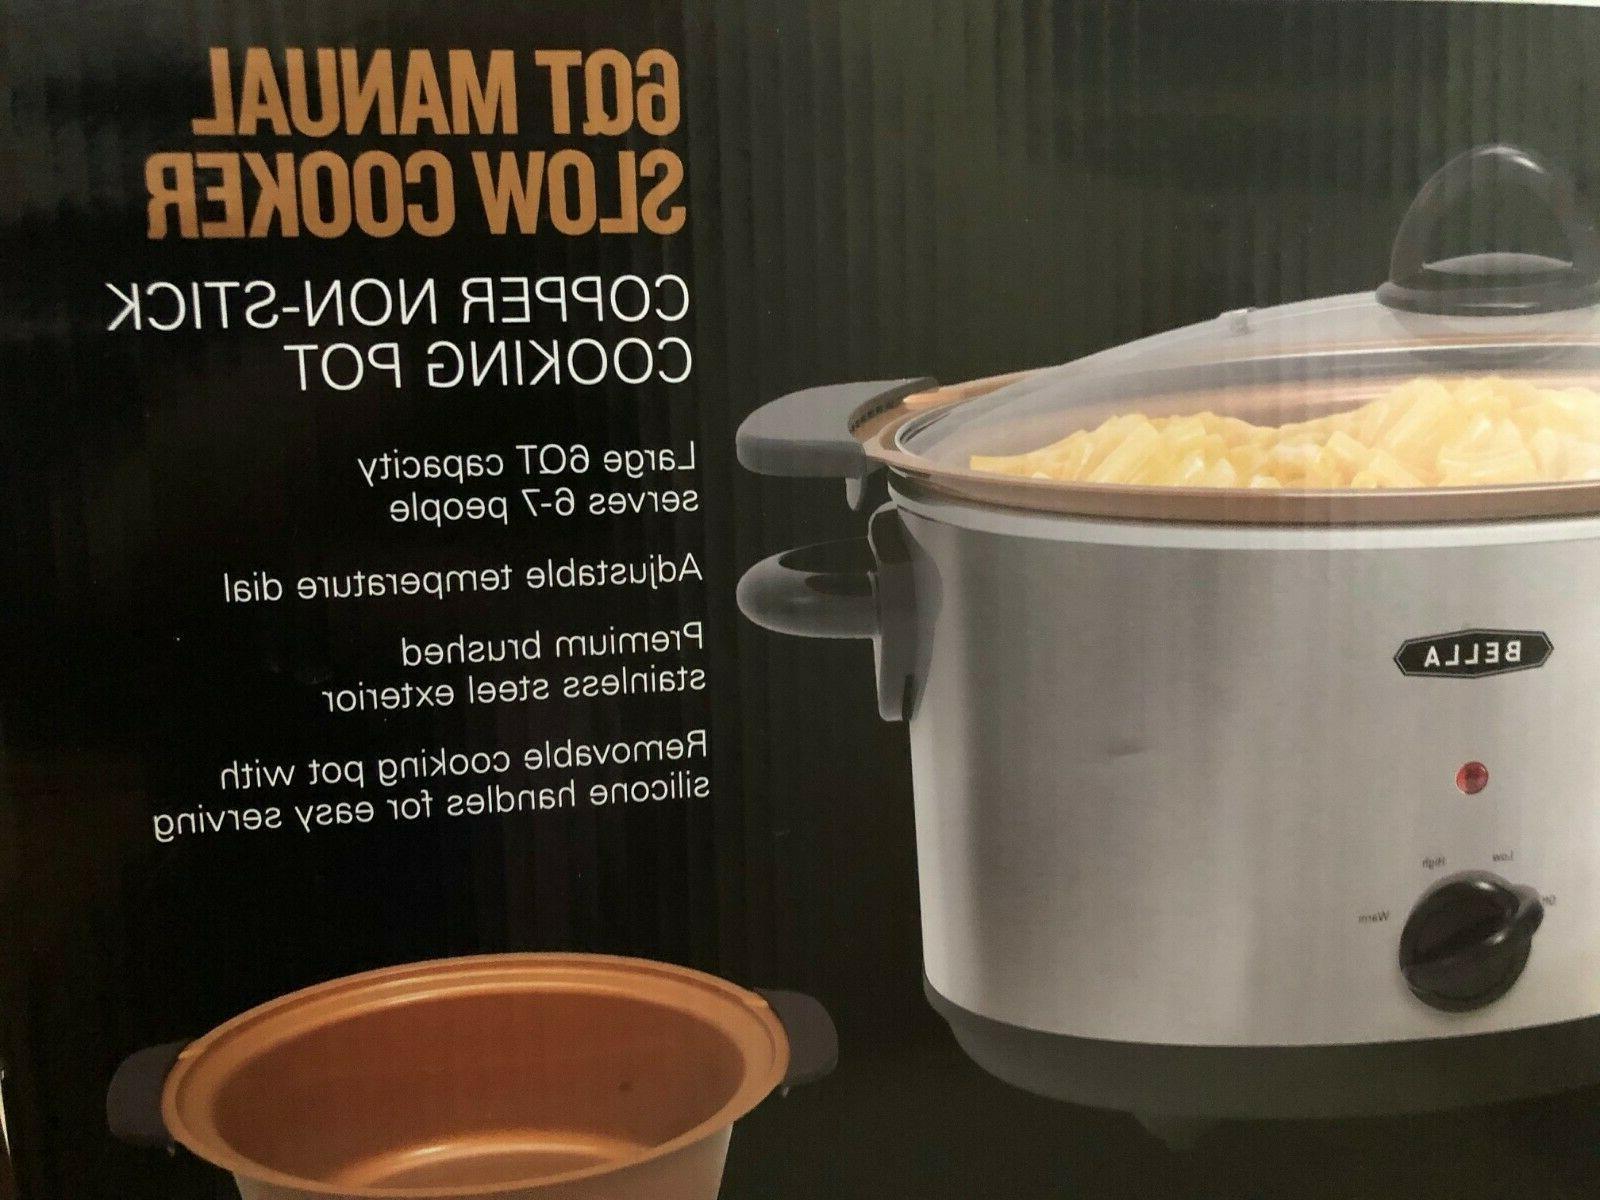 6 quart slow cooker w copper nonstick